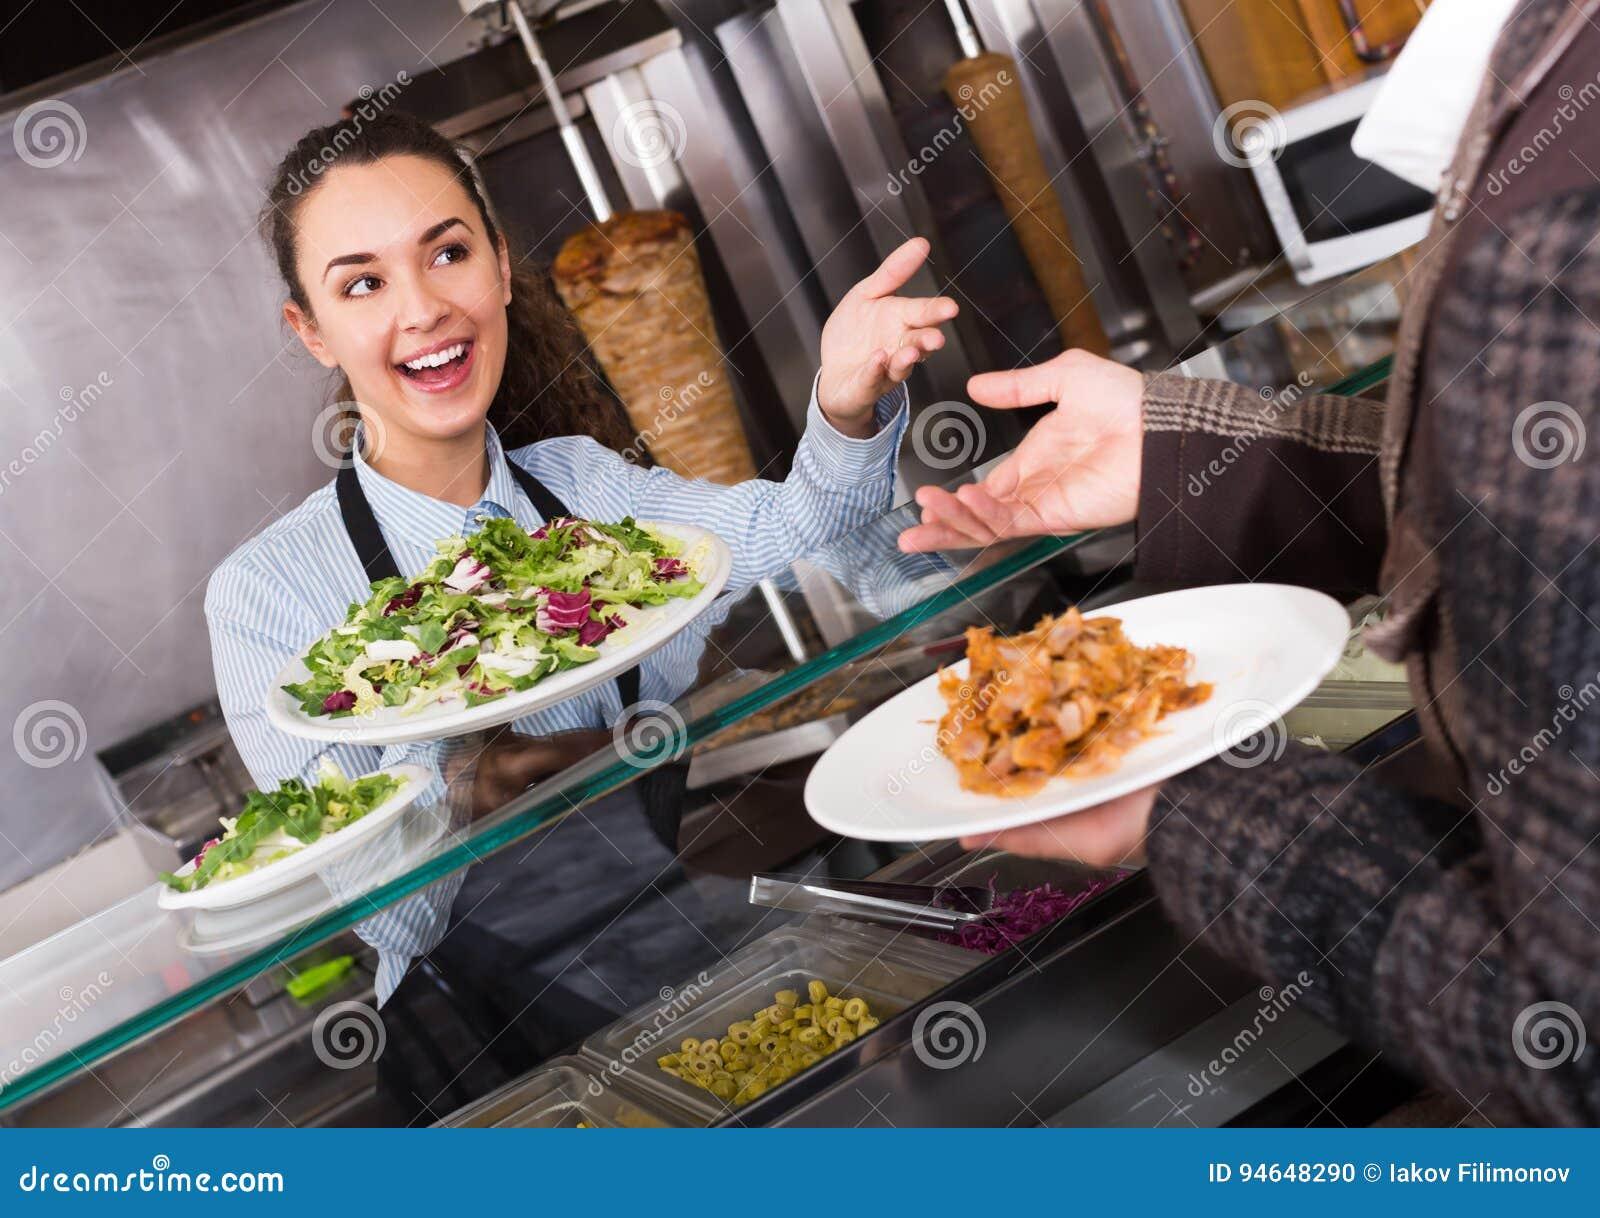 Positive female worker serving customer